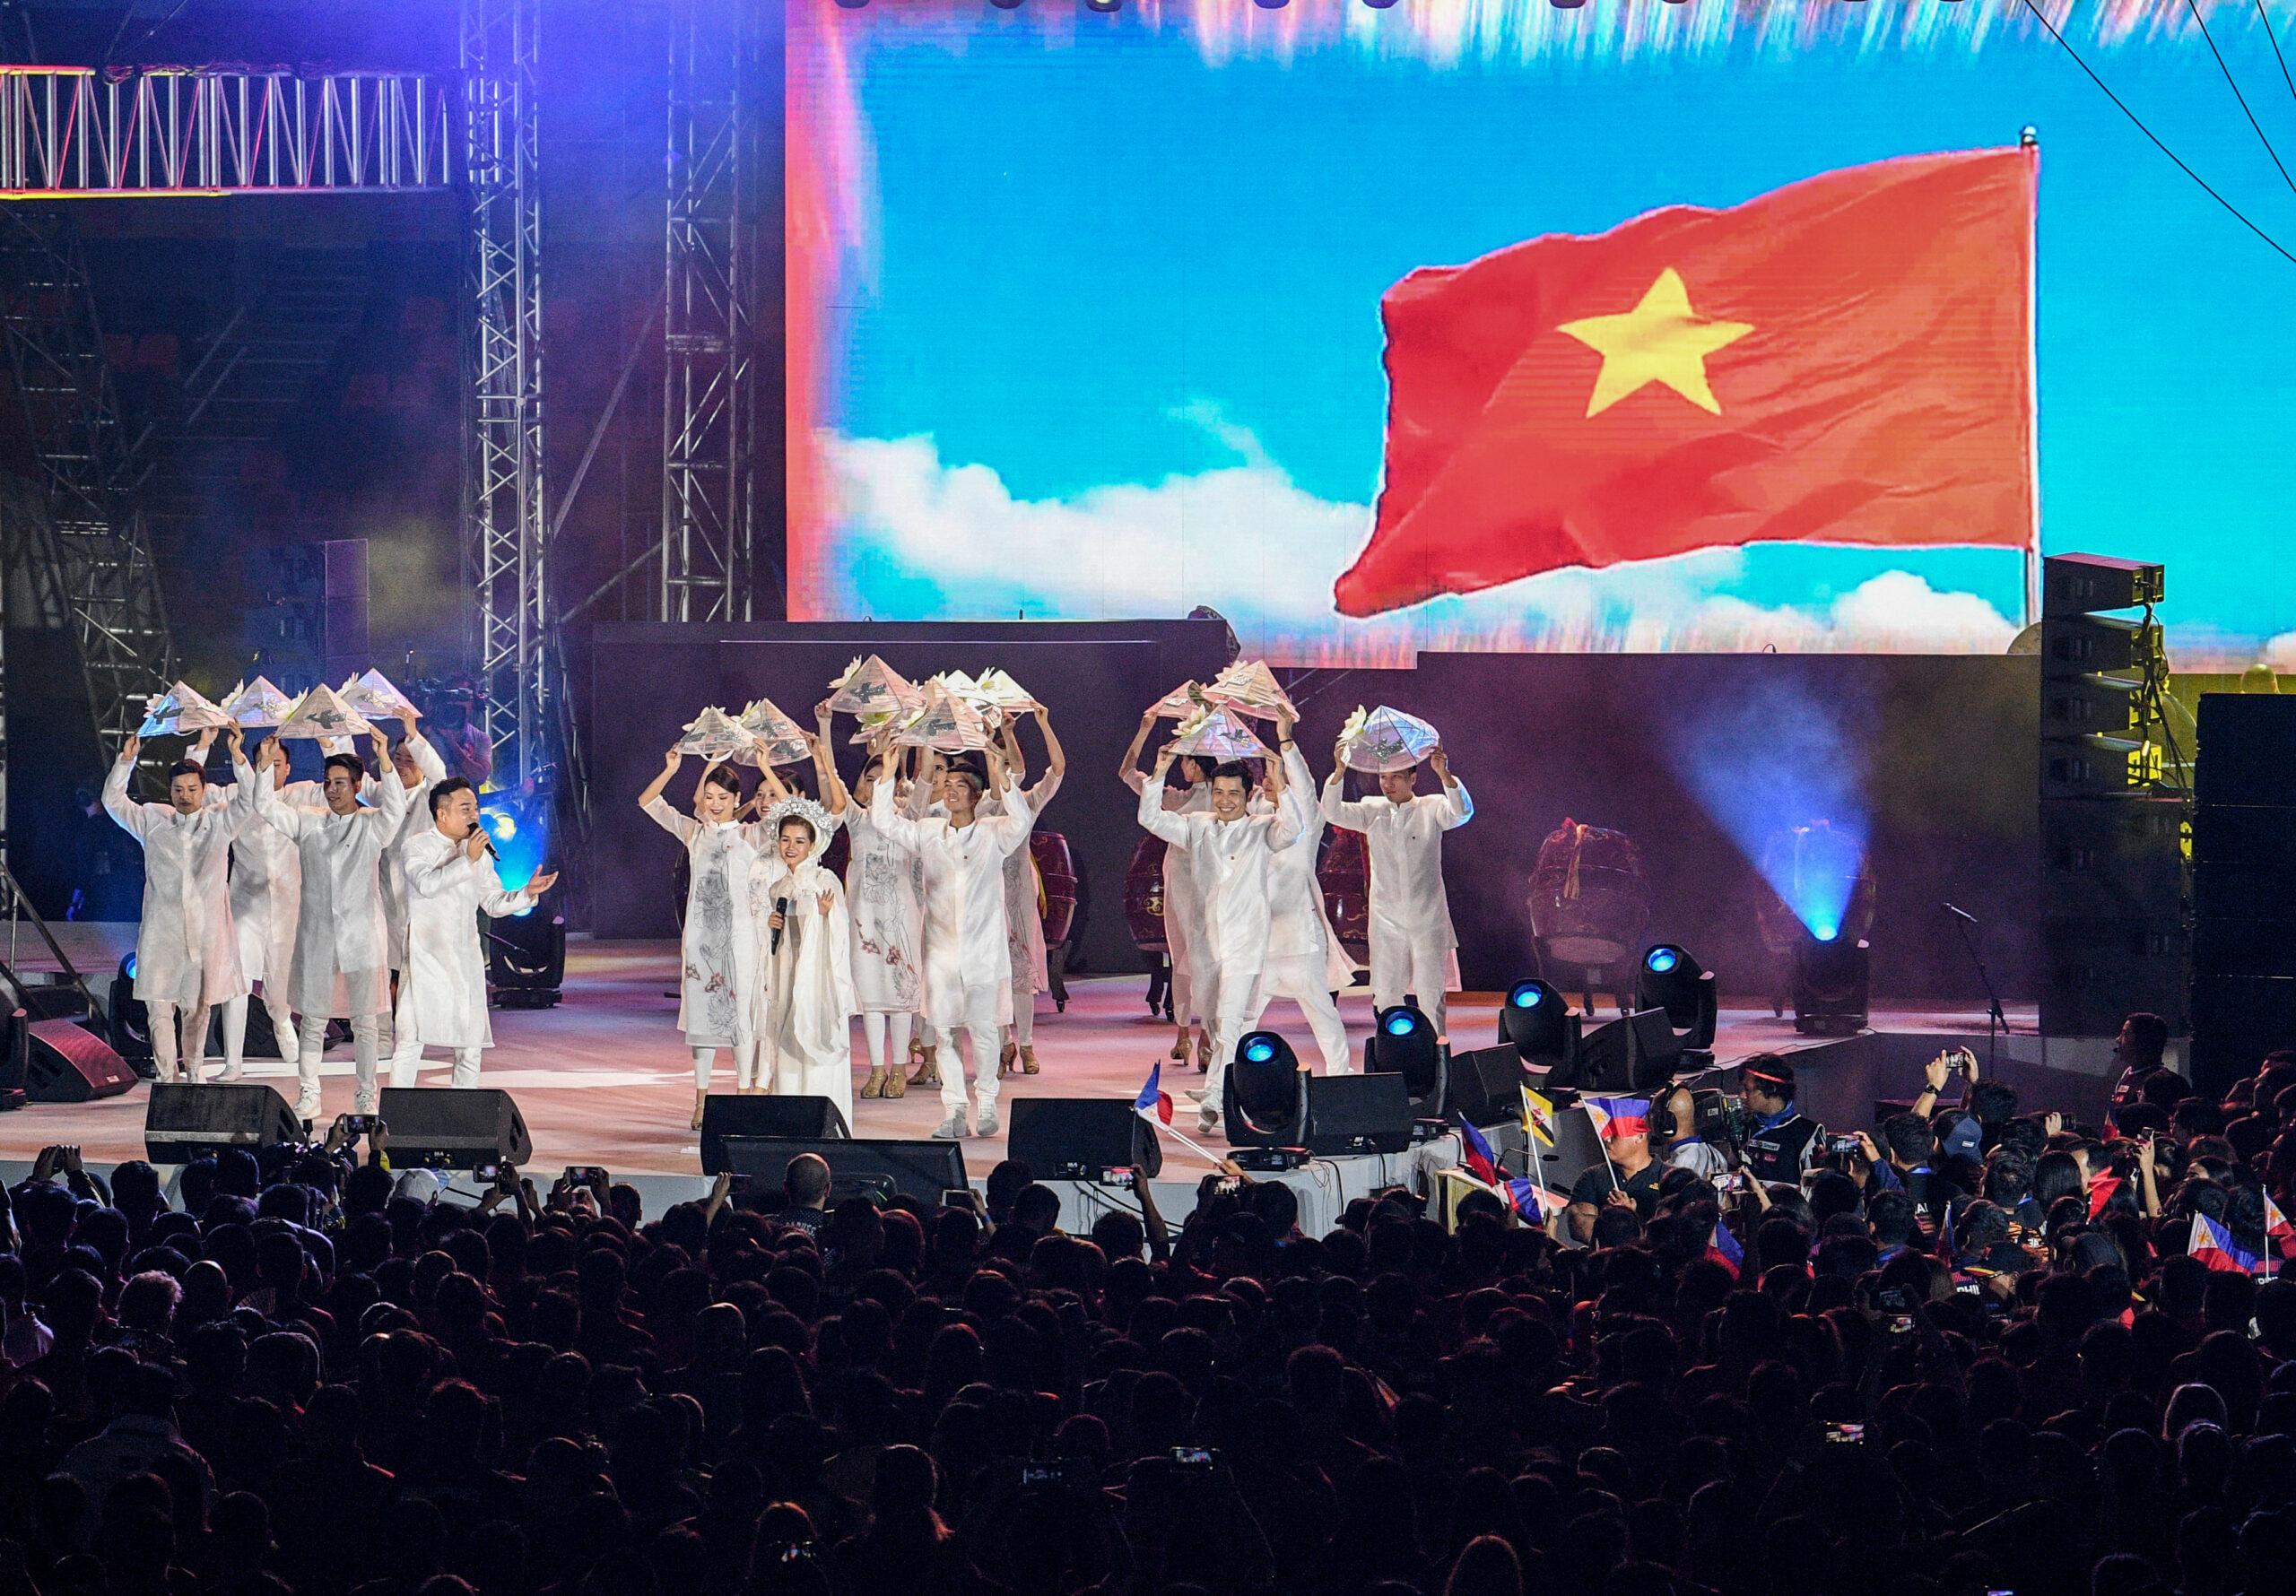 Vietnam set to postpone SEA Games until following year